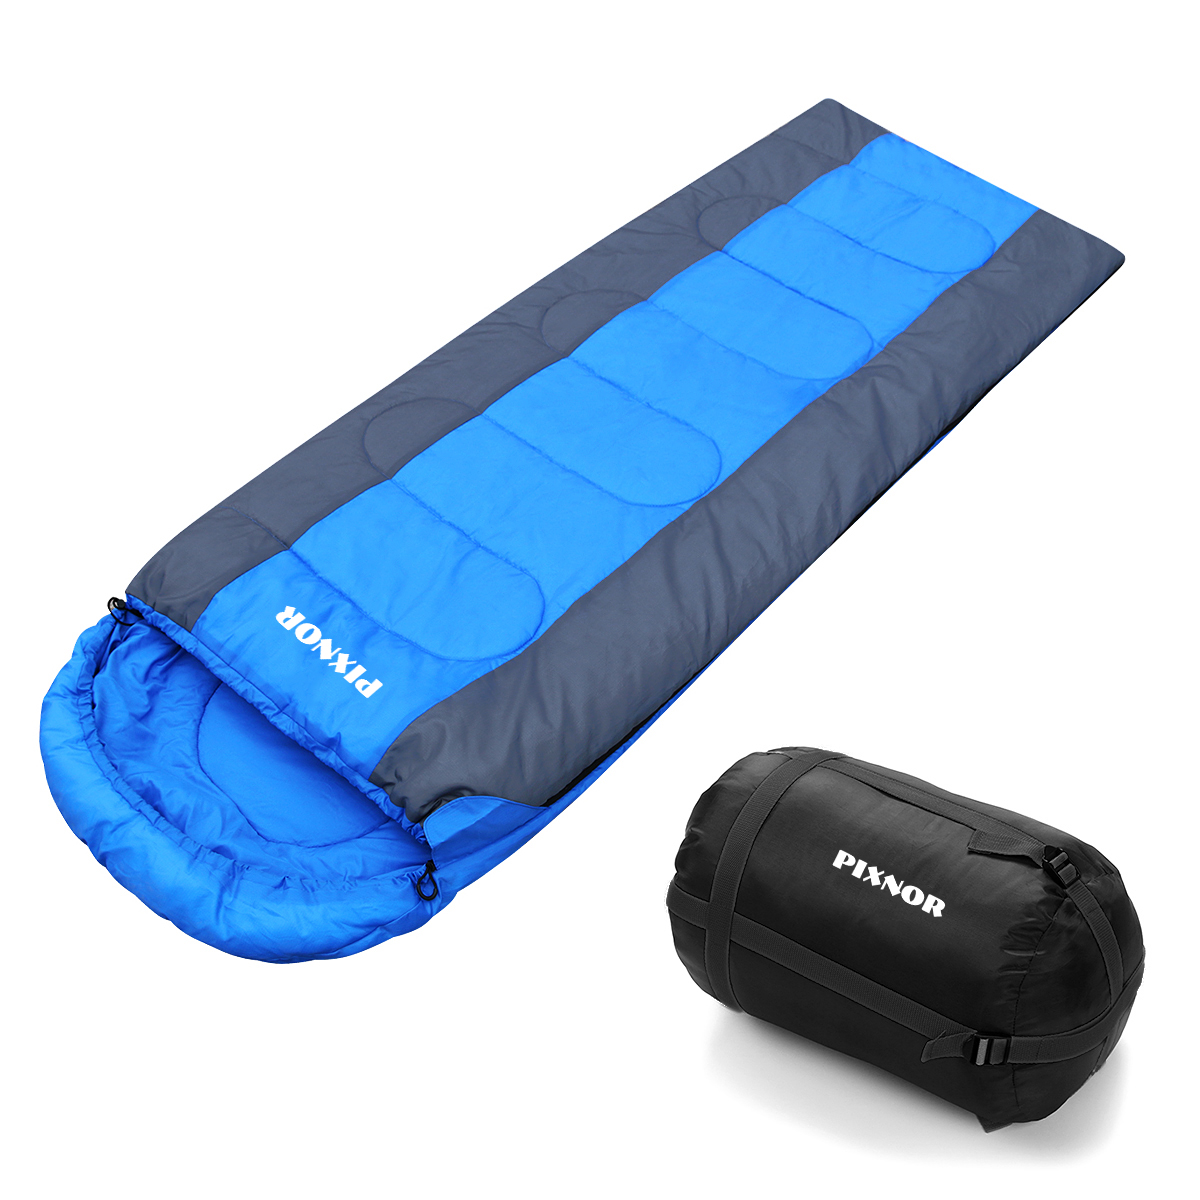 Waterproof Envelope Backpacking Sleeping Bag for Outdoors Activity Camping